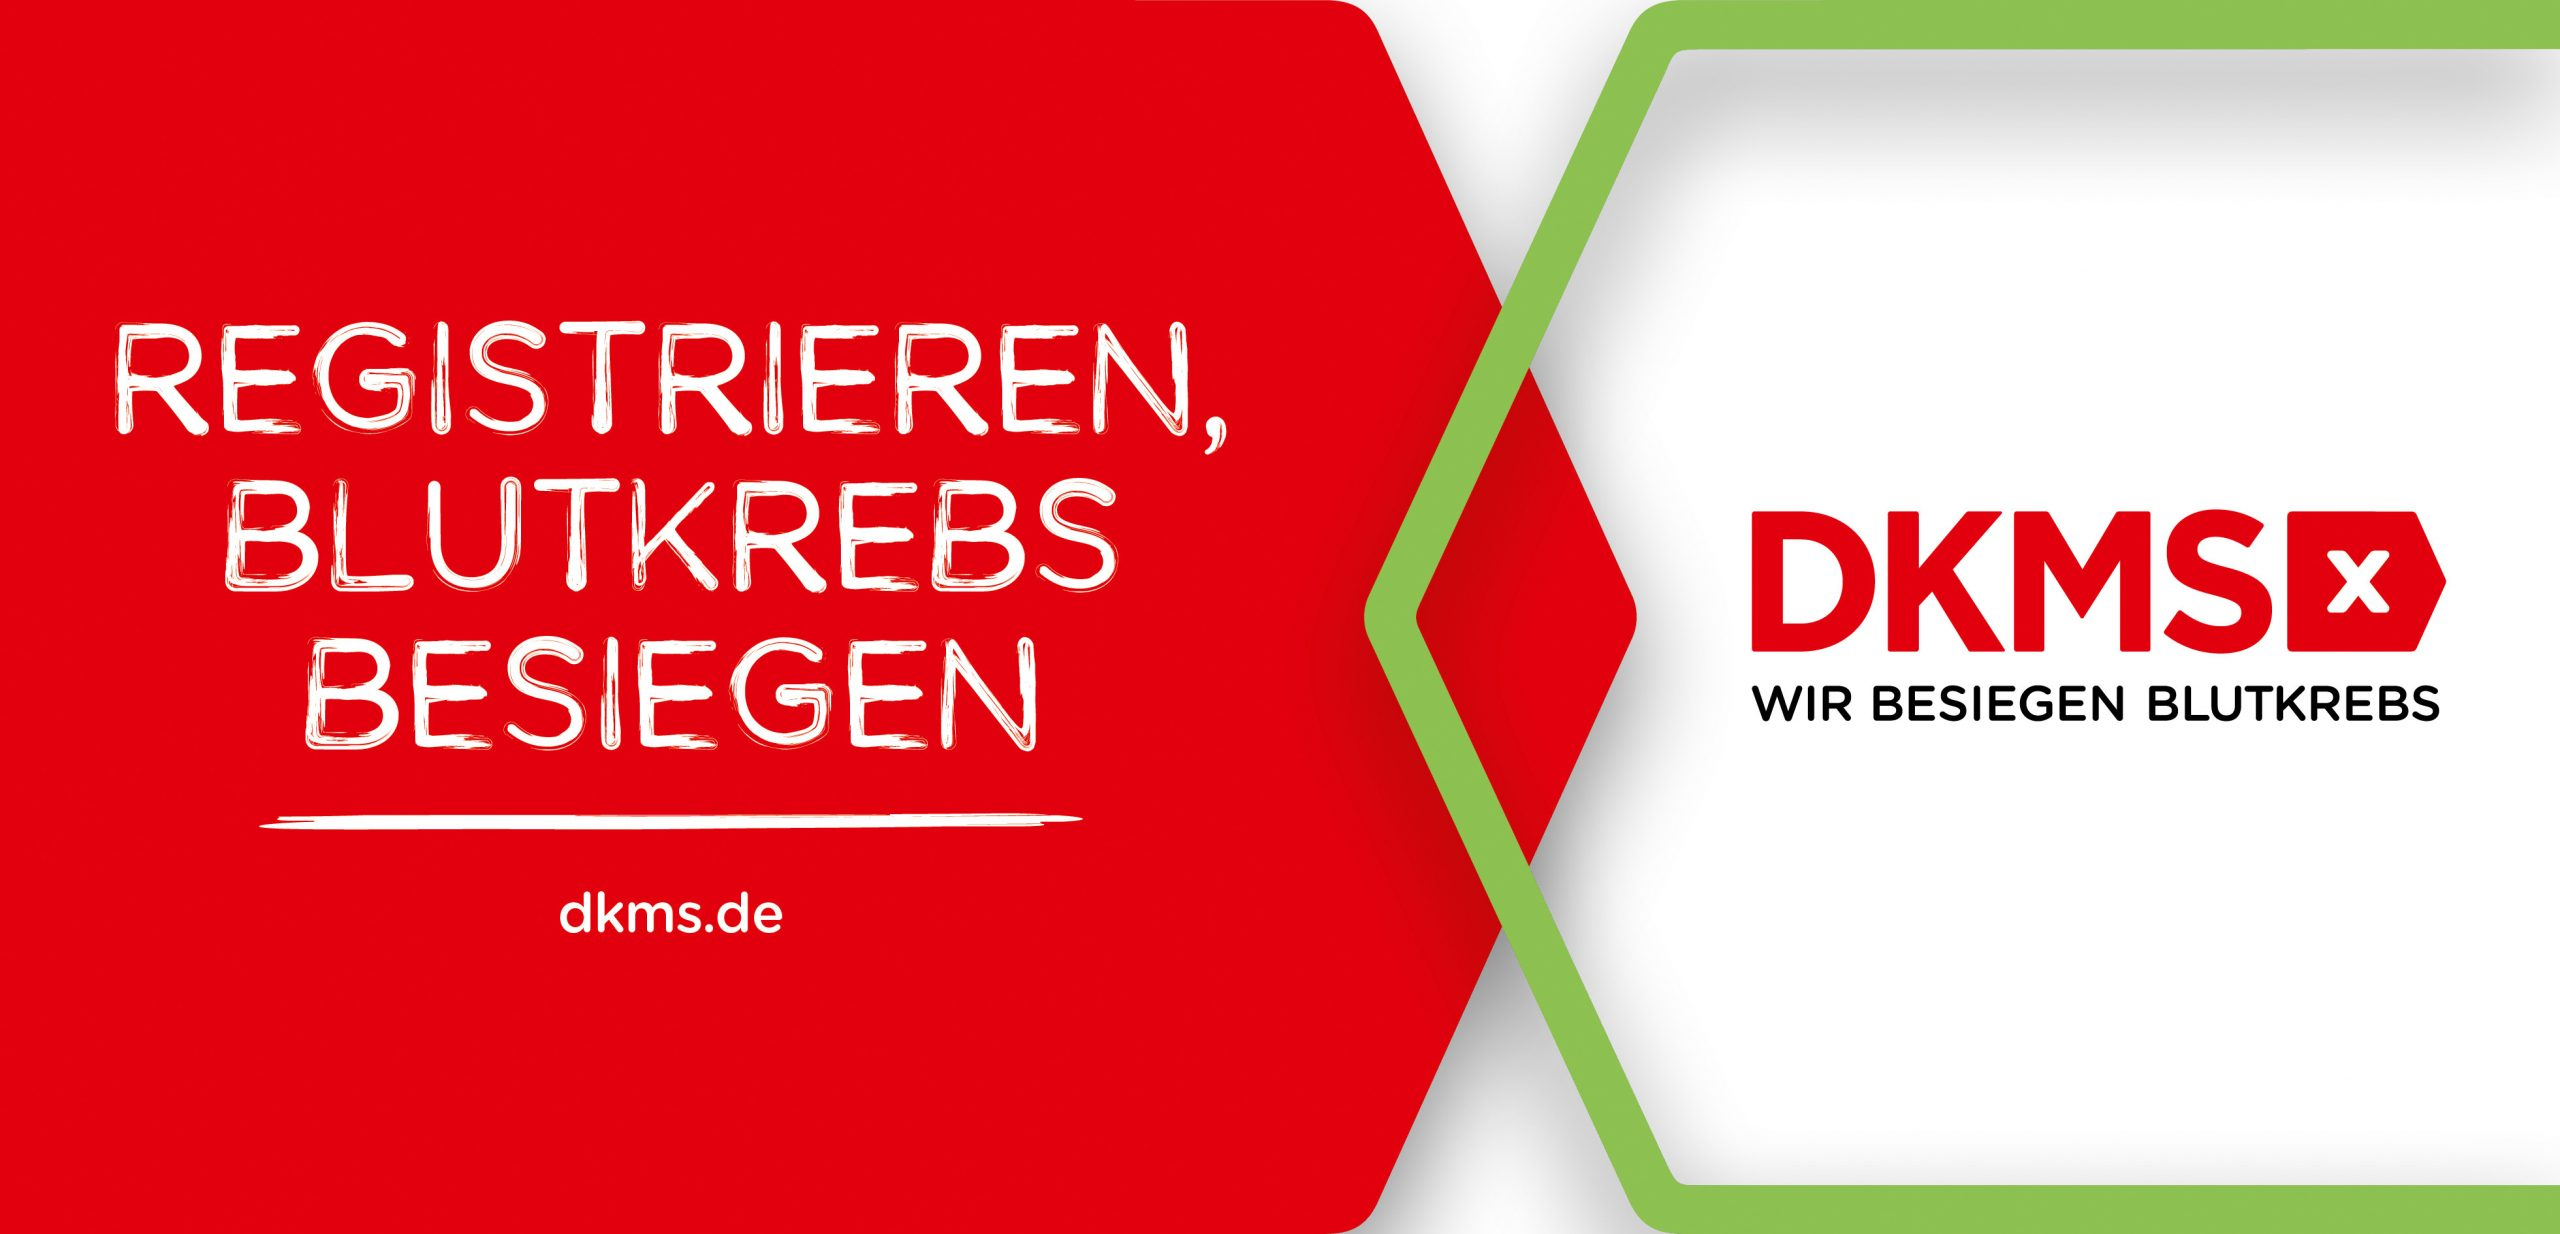 DKMS_Traegerflaeche_2016_06_13_RGB